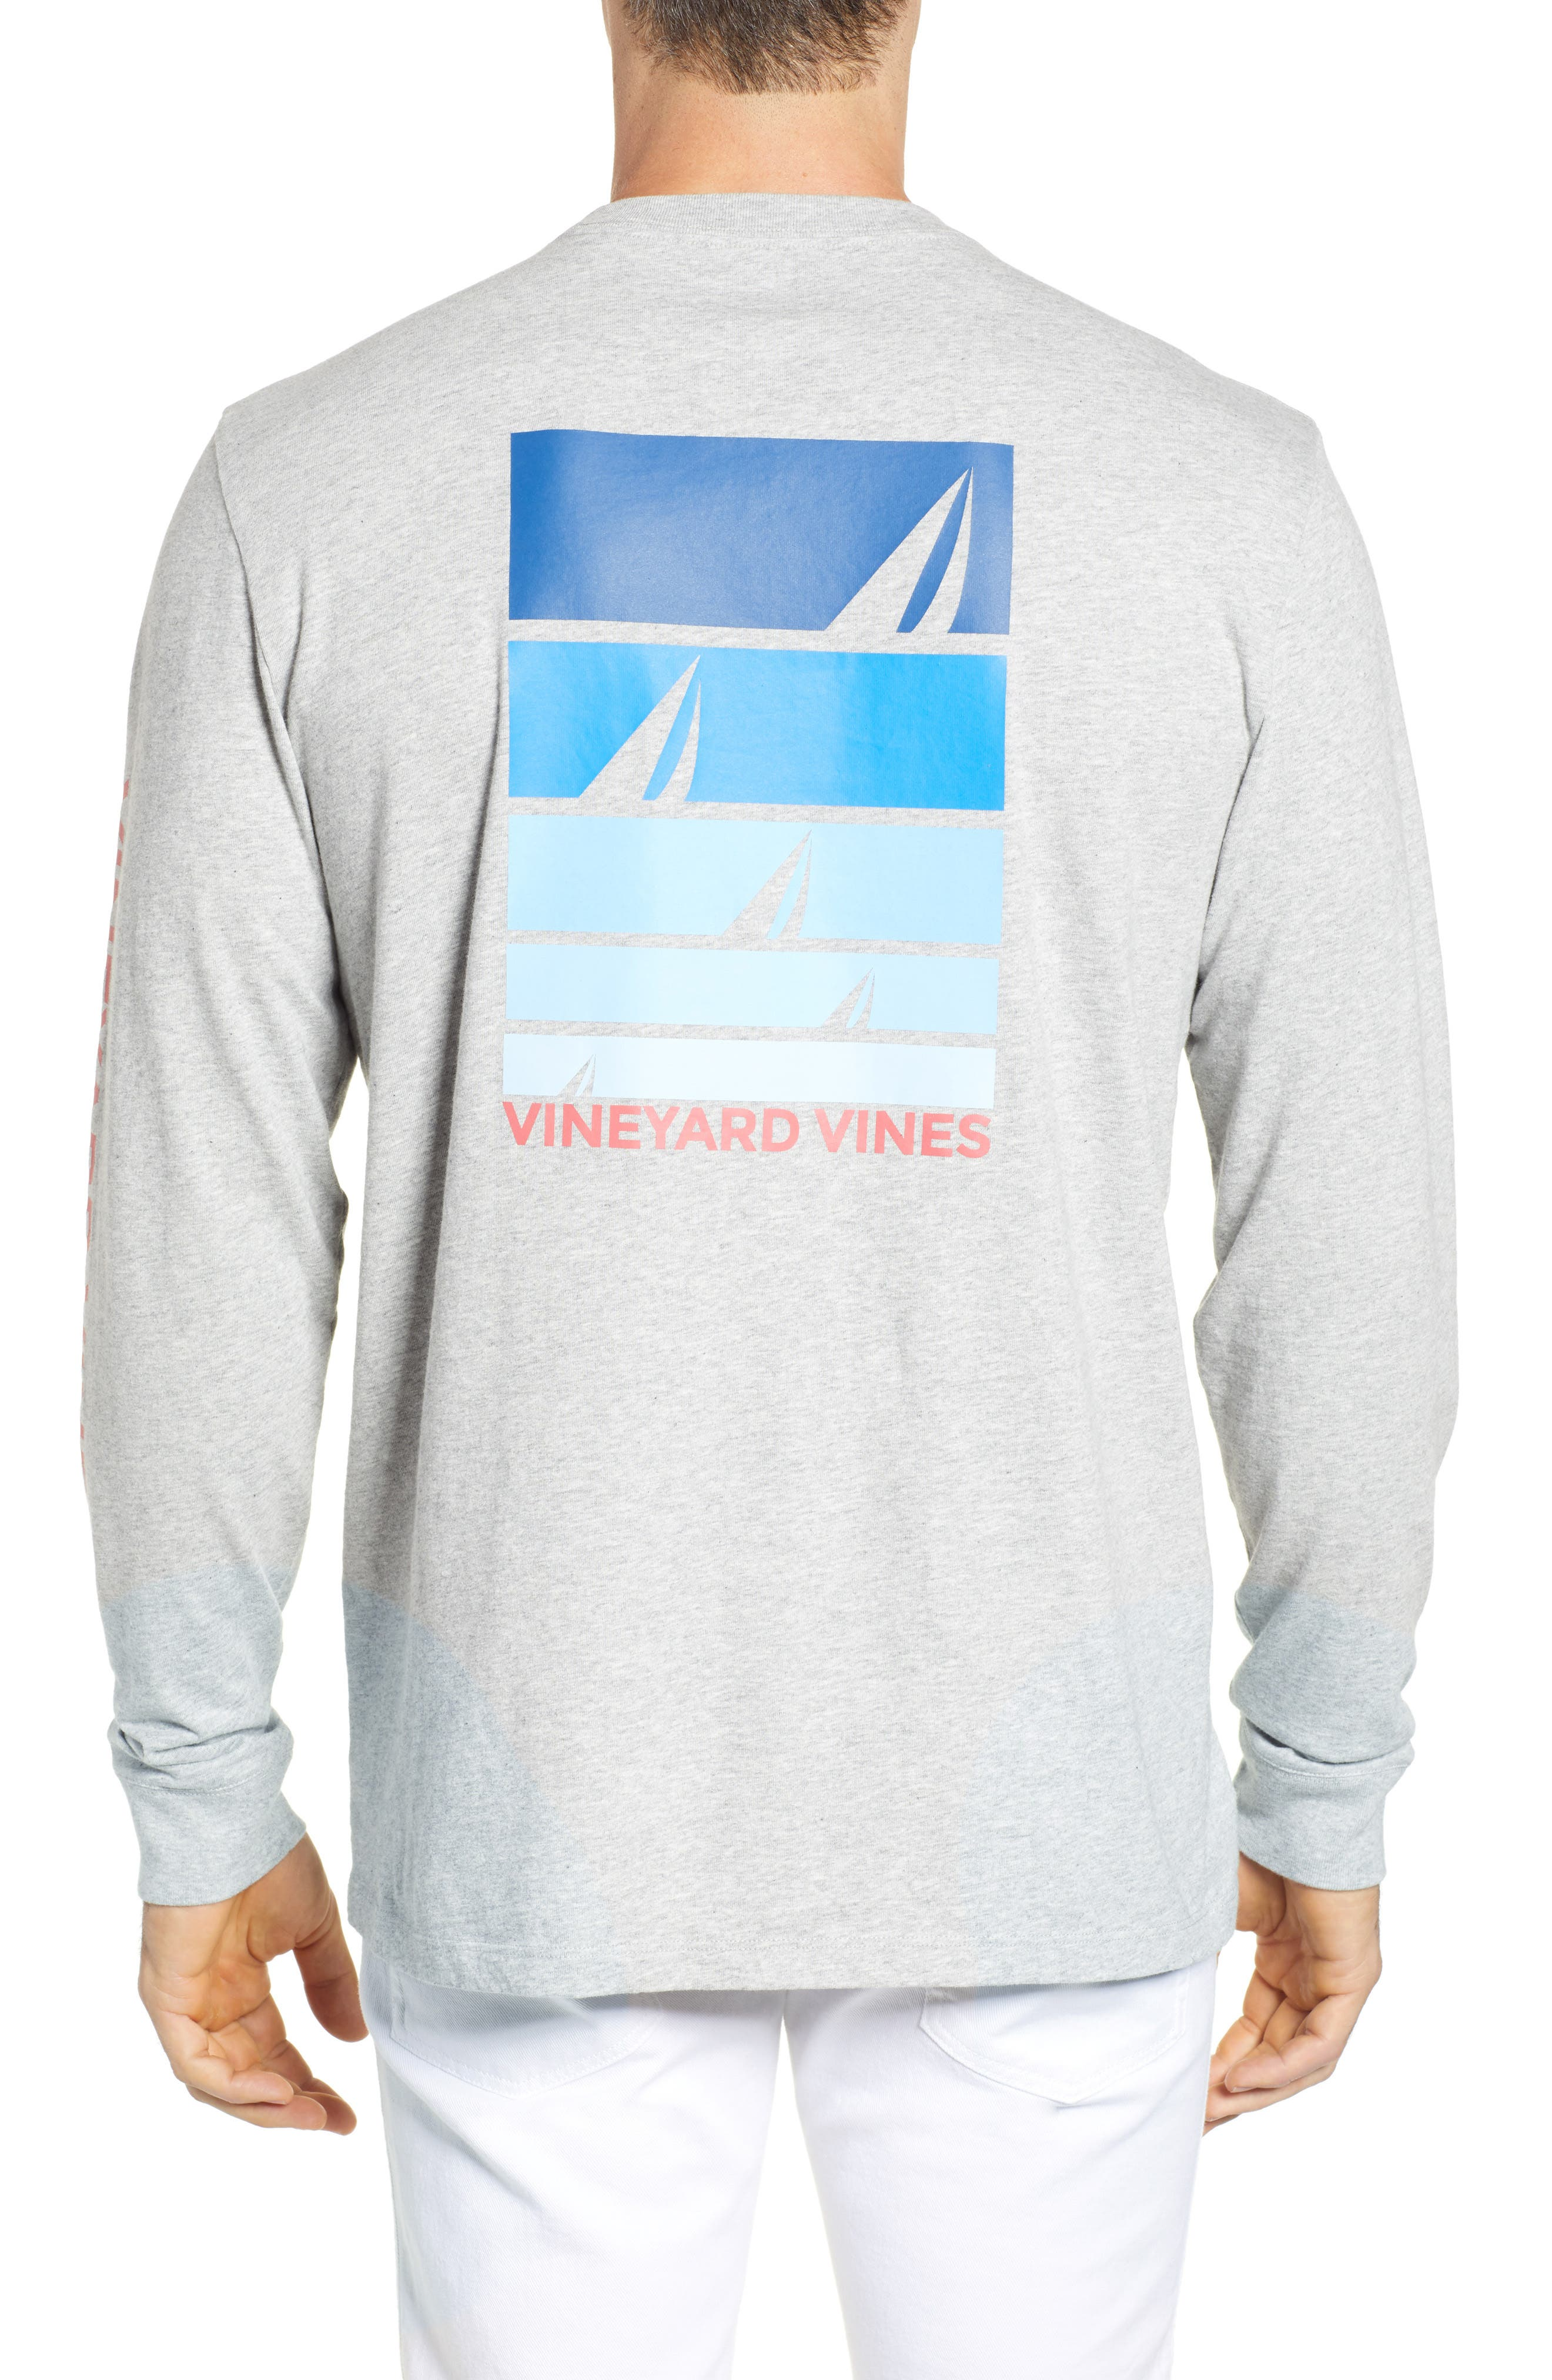 VINEYARD VINES,                             Sailing Blue Regular Fit Crewneck T-Shirt,                             Alternate thumbnail 2, color,                             039